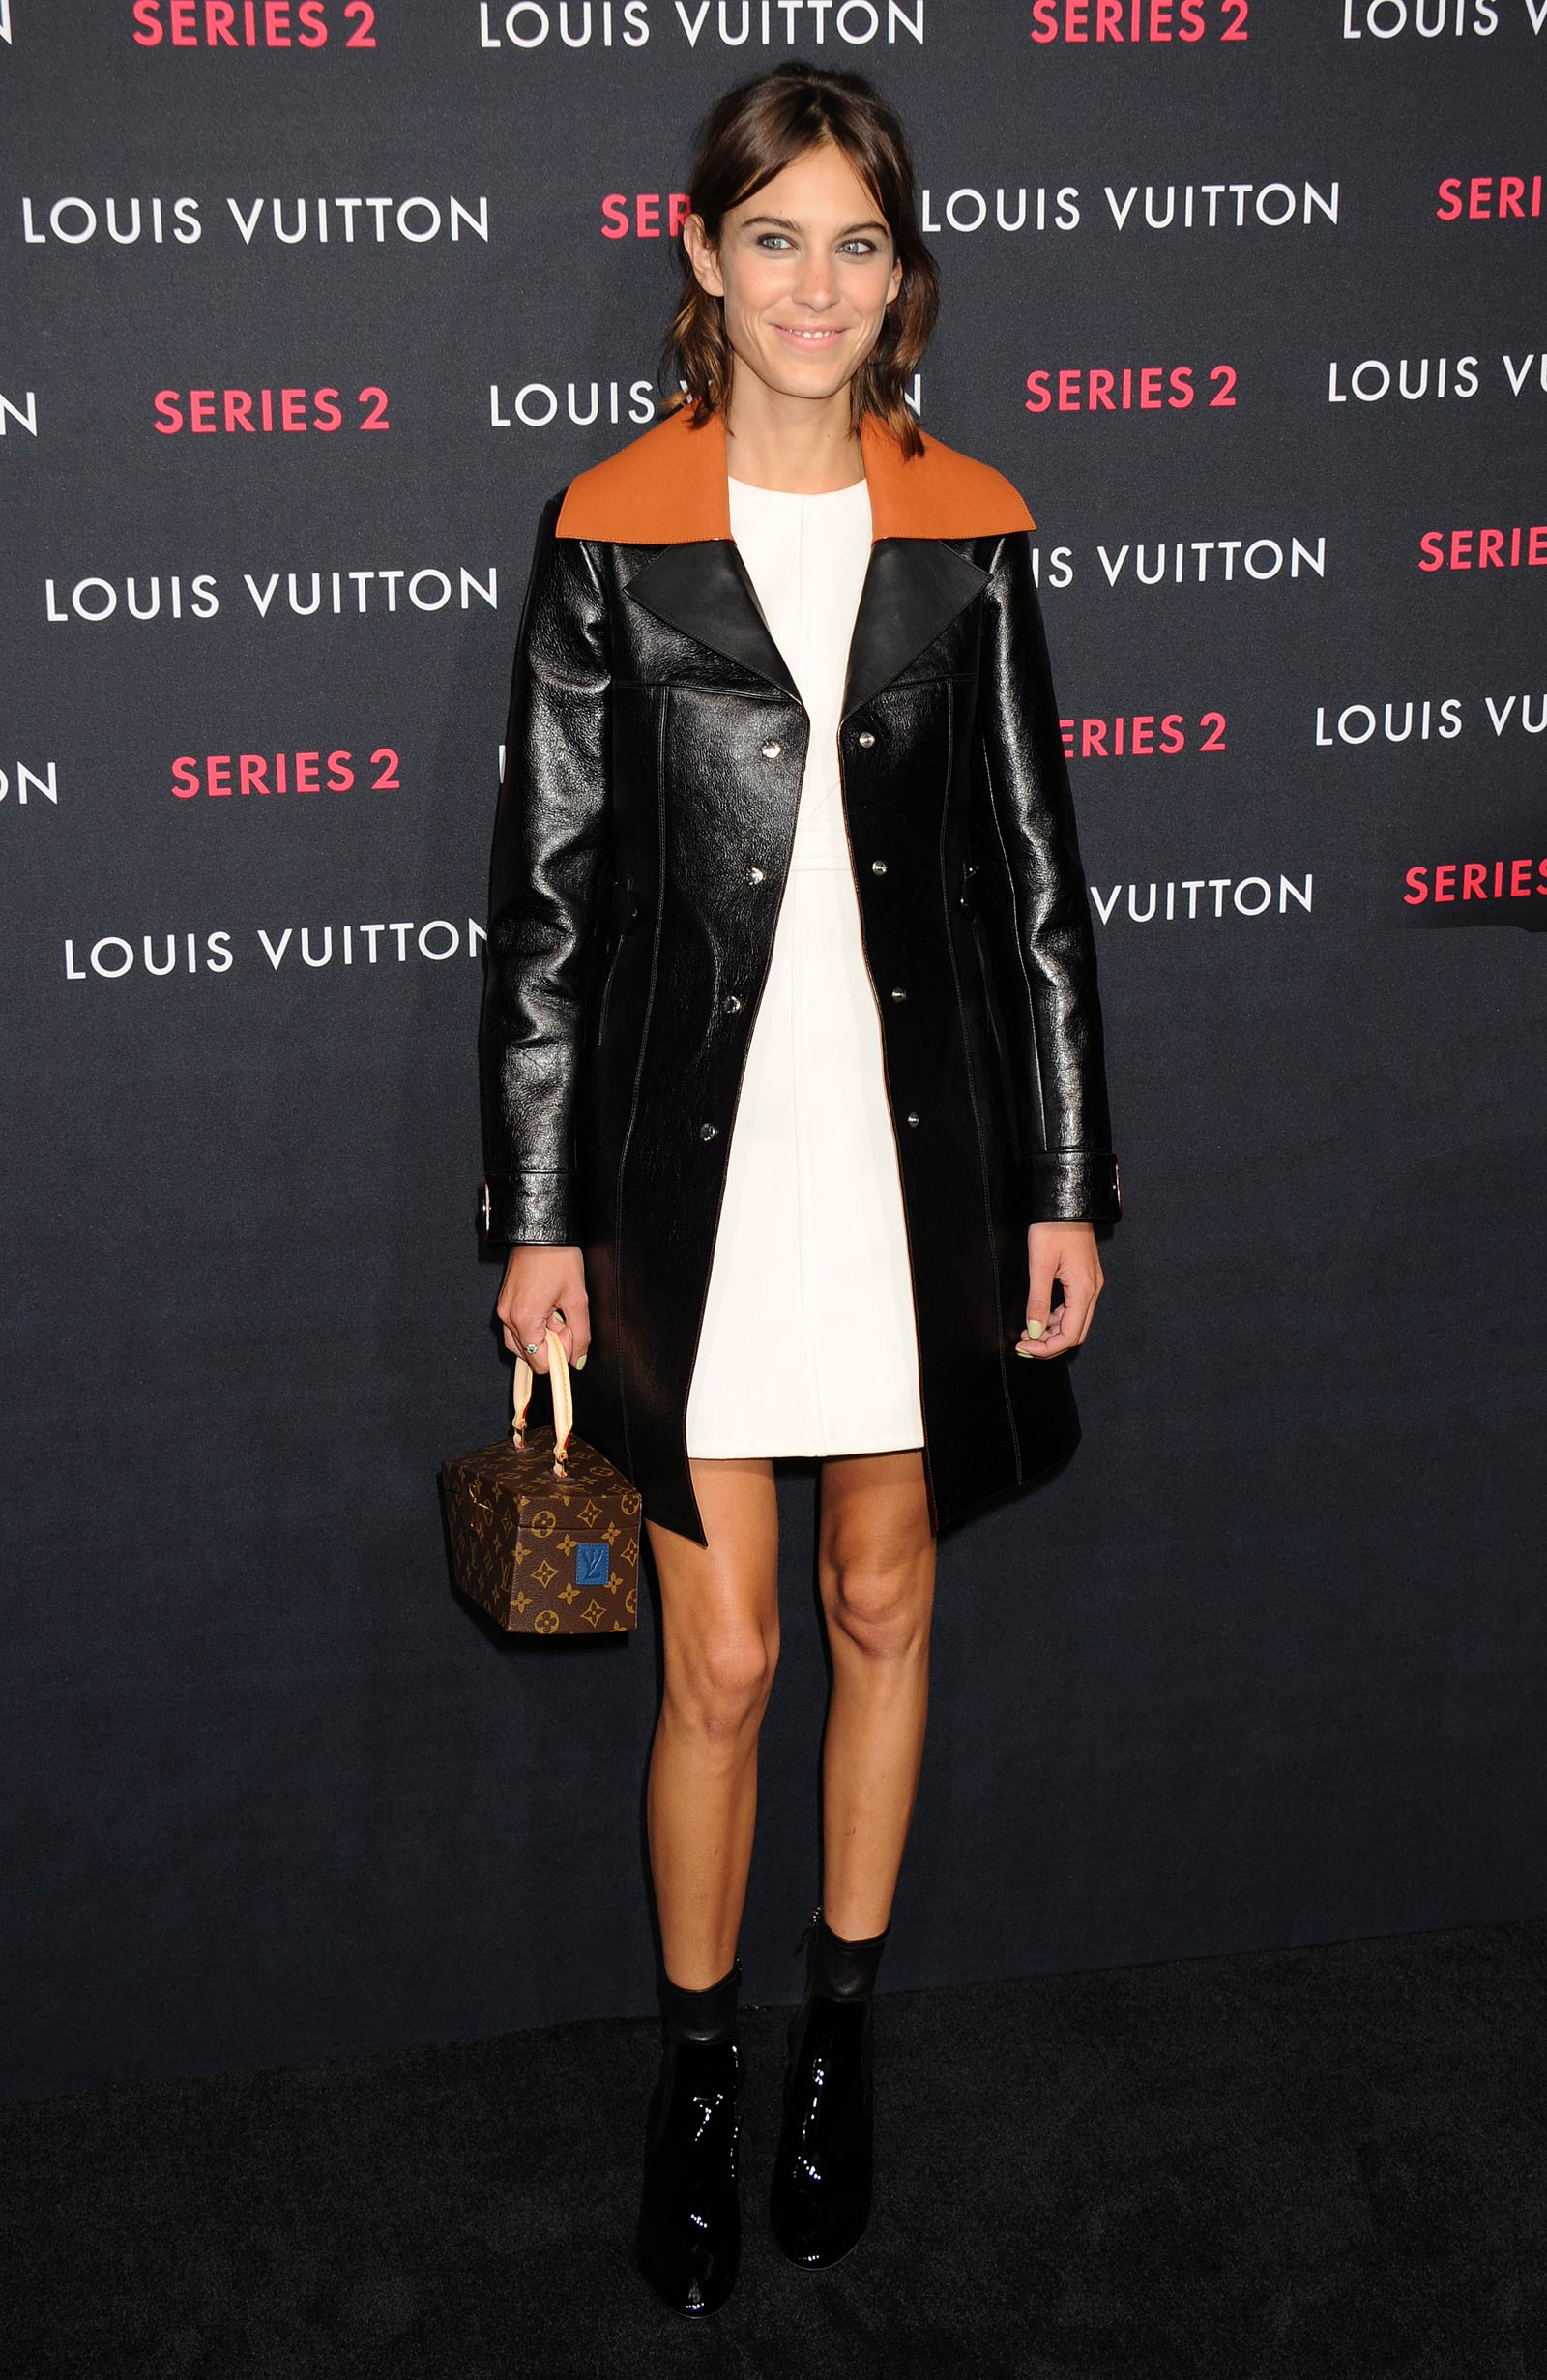 Alexa Chung attends Louis Vuitton Series 2 The Exhibition